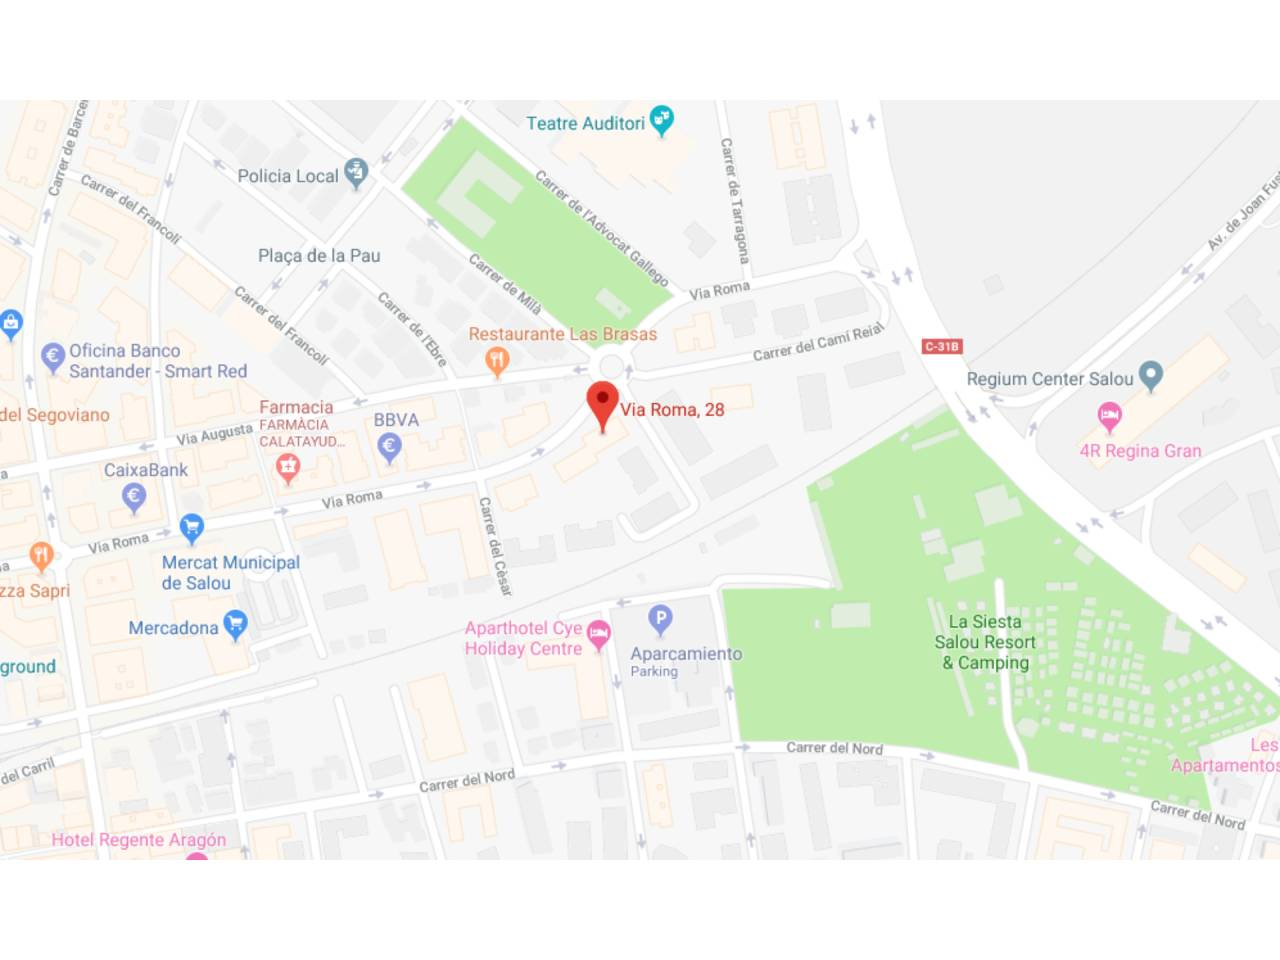 Miete Autoparkplatz  Calle via roma, 28. Alquiler de plaza de parking en el centro de Salou.  en la calle